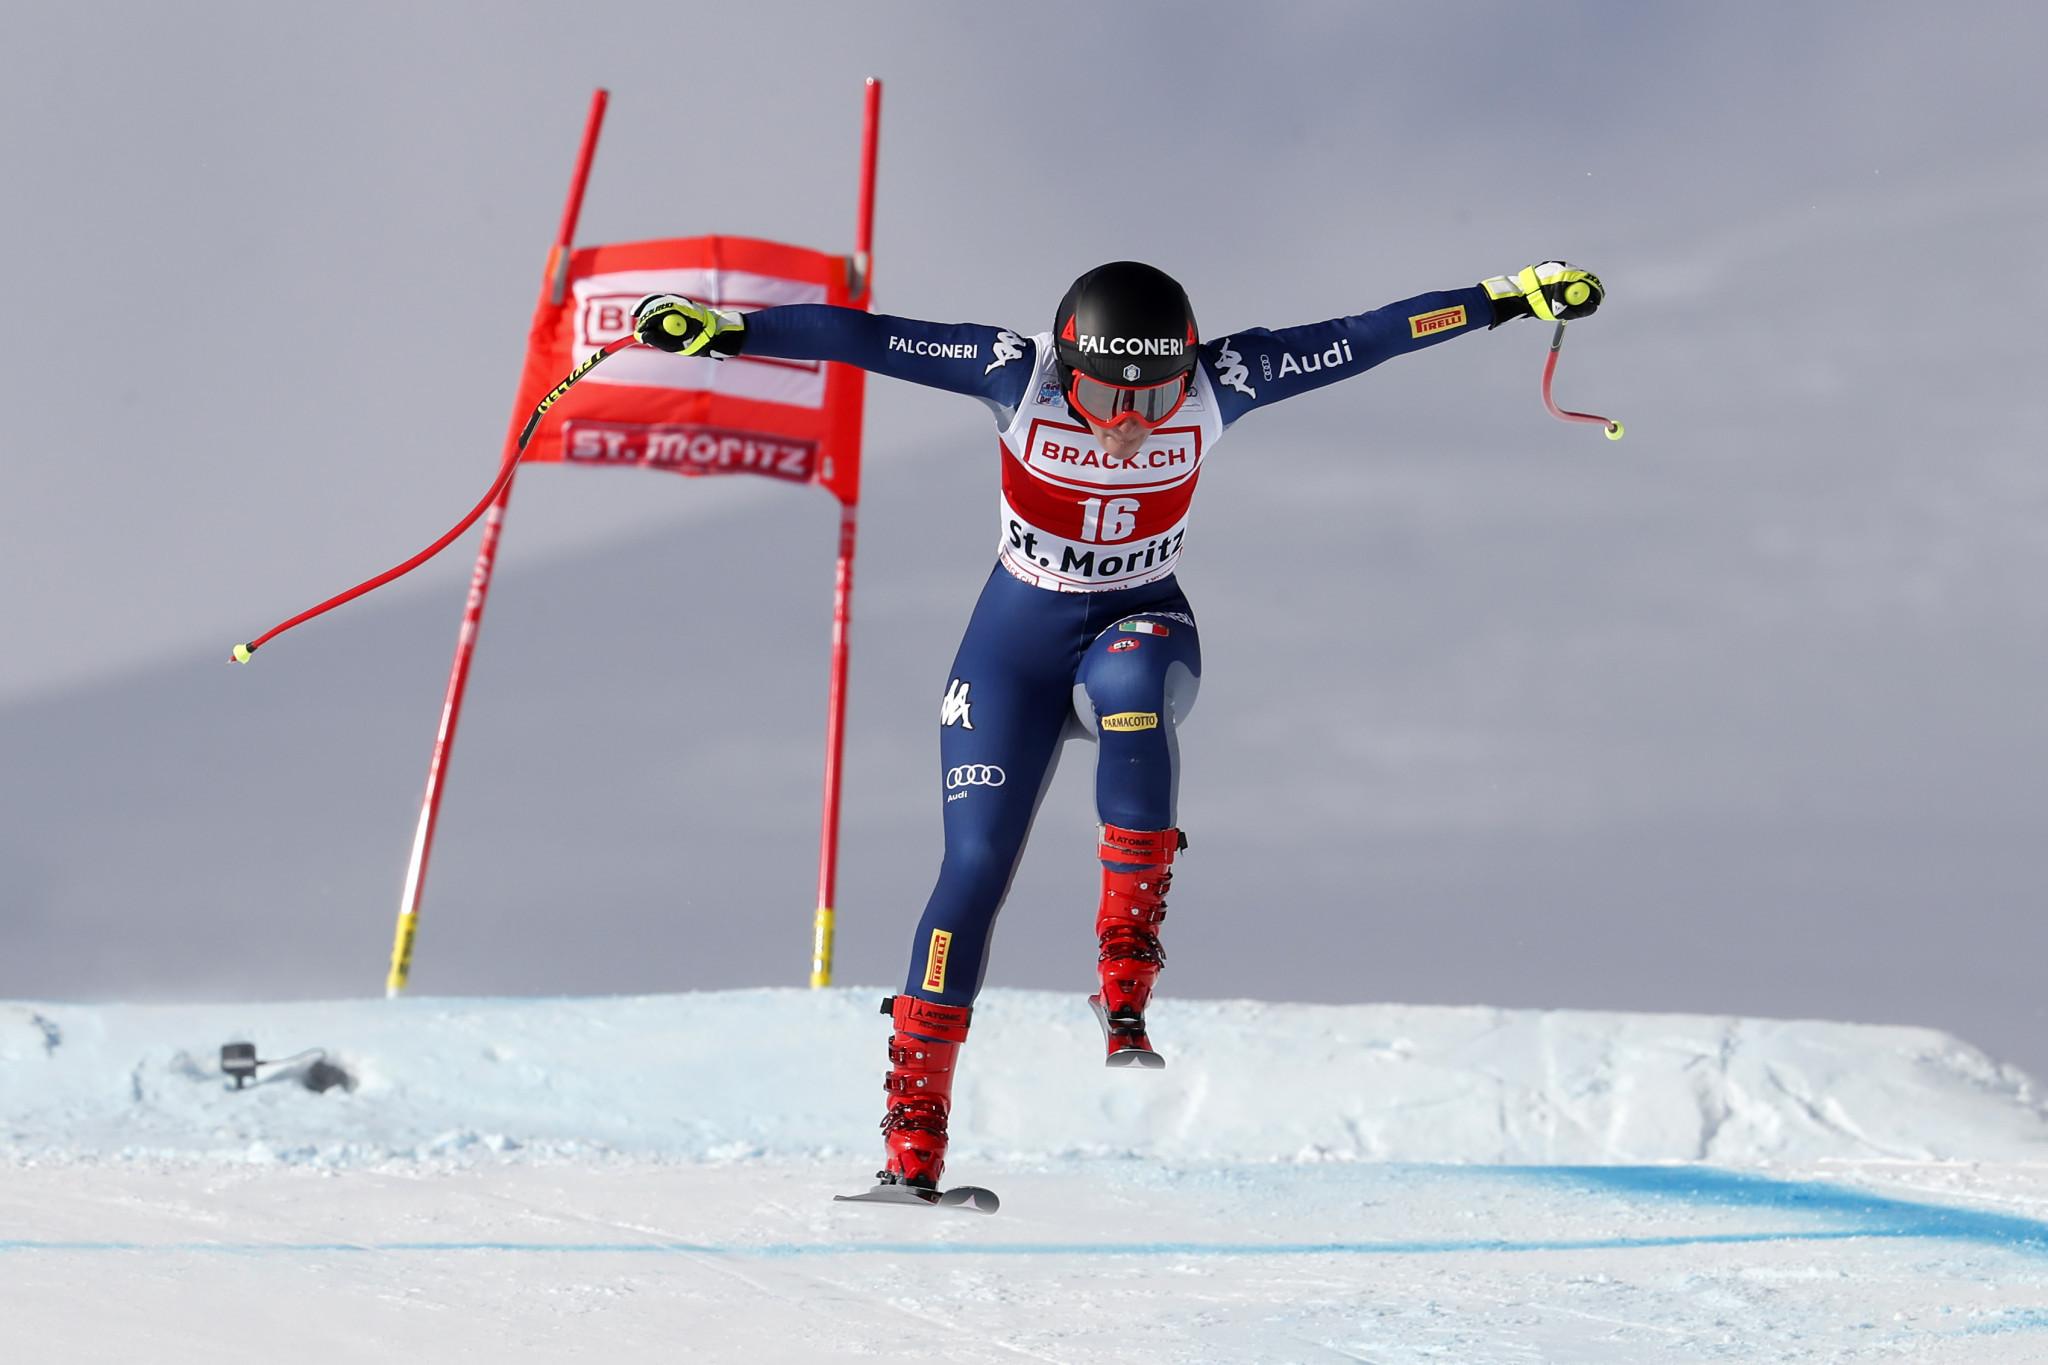 Sofia Goggia triumphed in the women's super-G event ©Getty Images